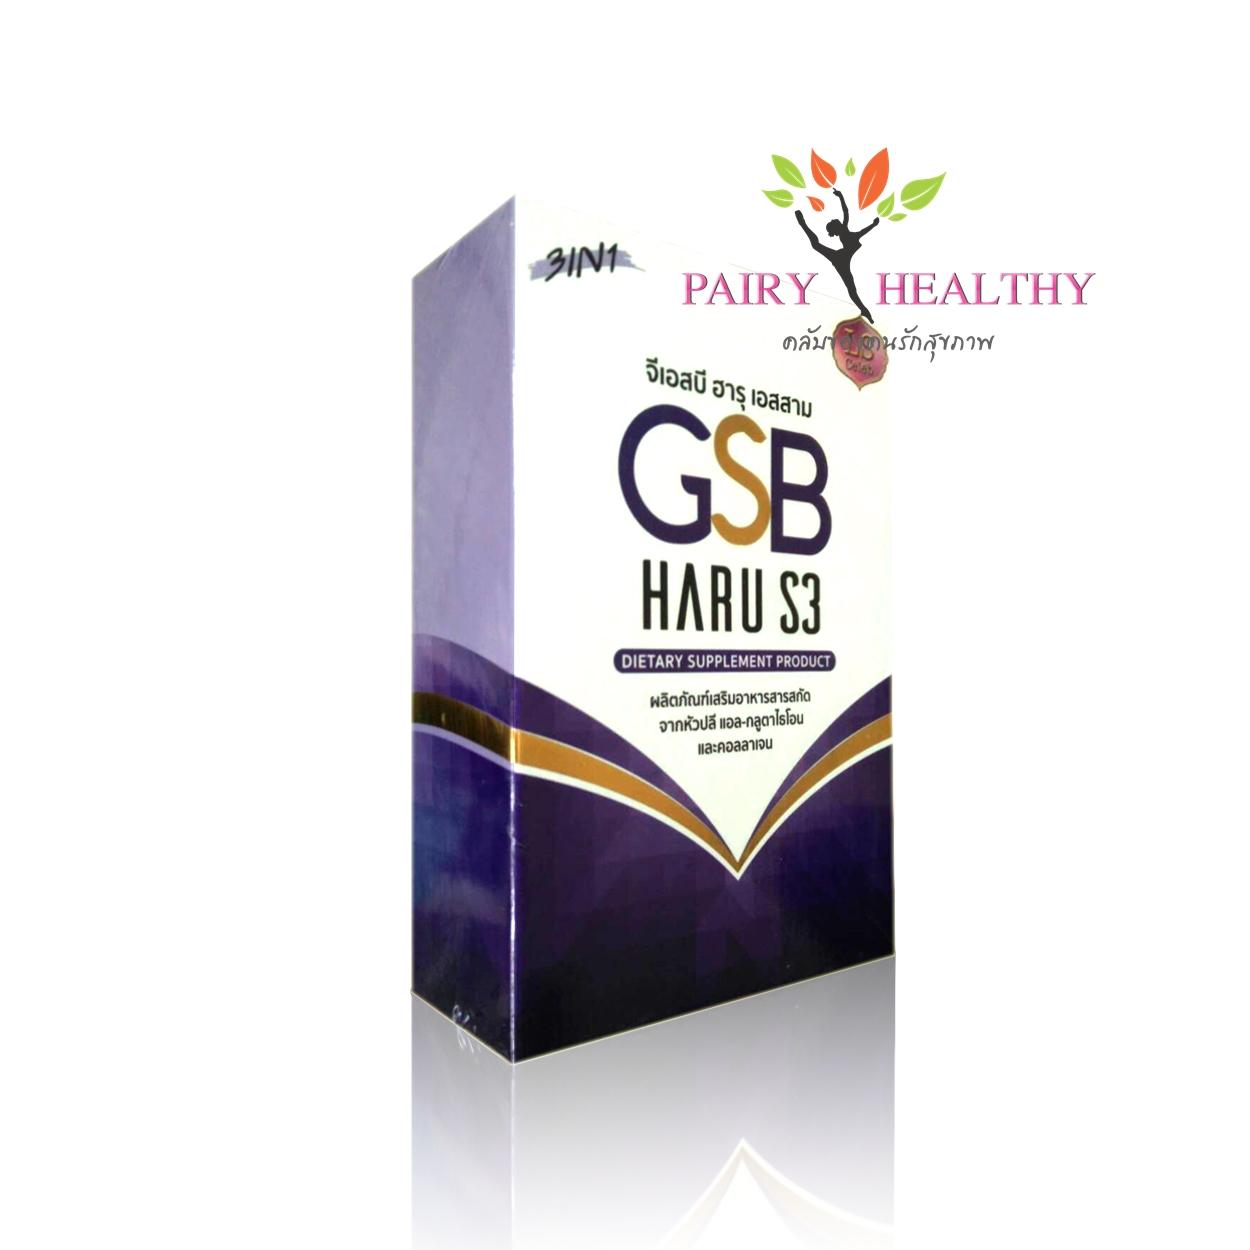 LS Celeb GSB Haru S3 อาหารเสริมสำหรับสตรี 30 แคปซูล ราคา 385 บาท ส่งฟรี